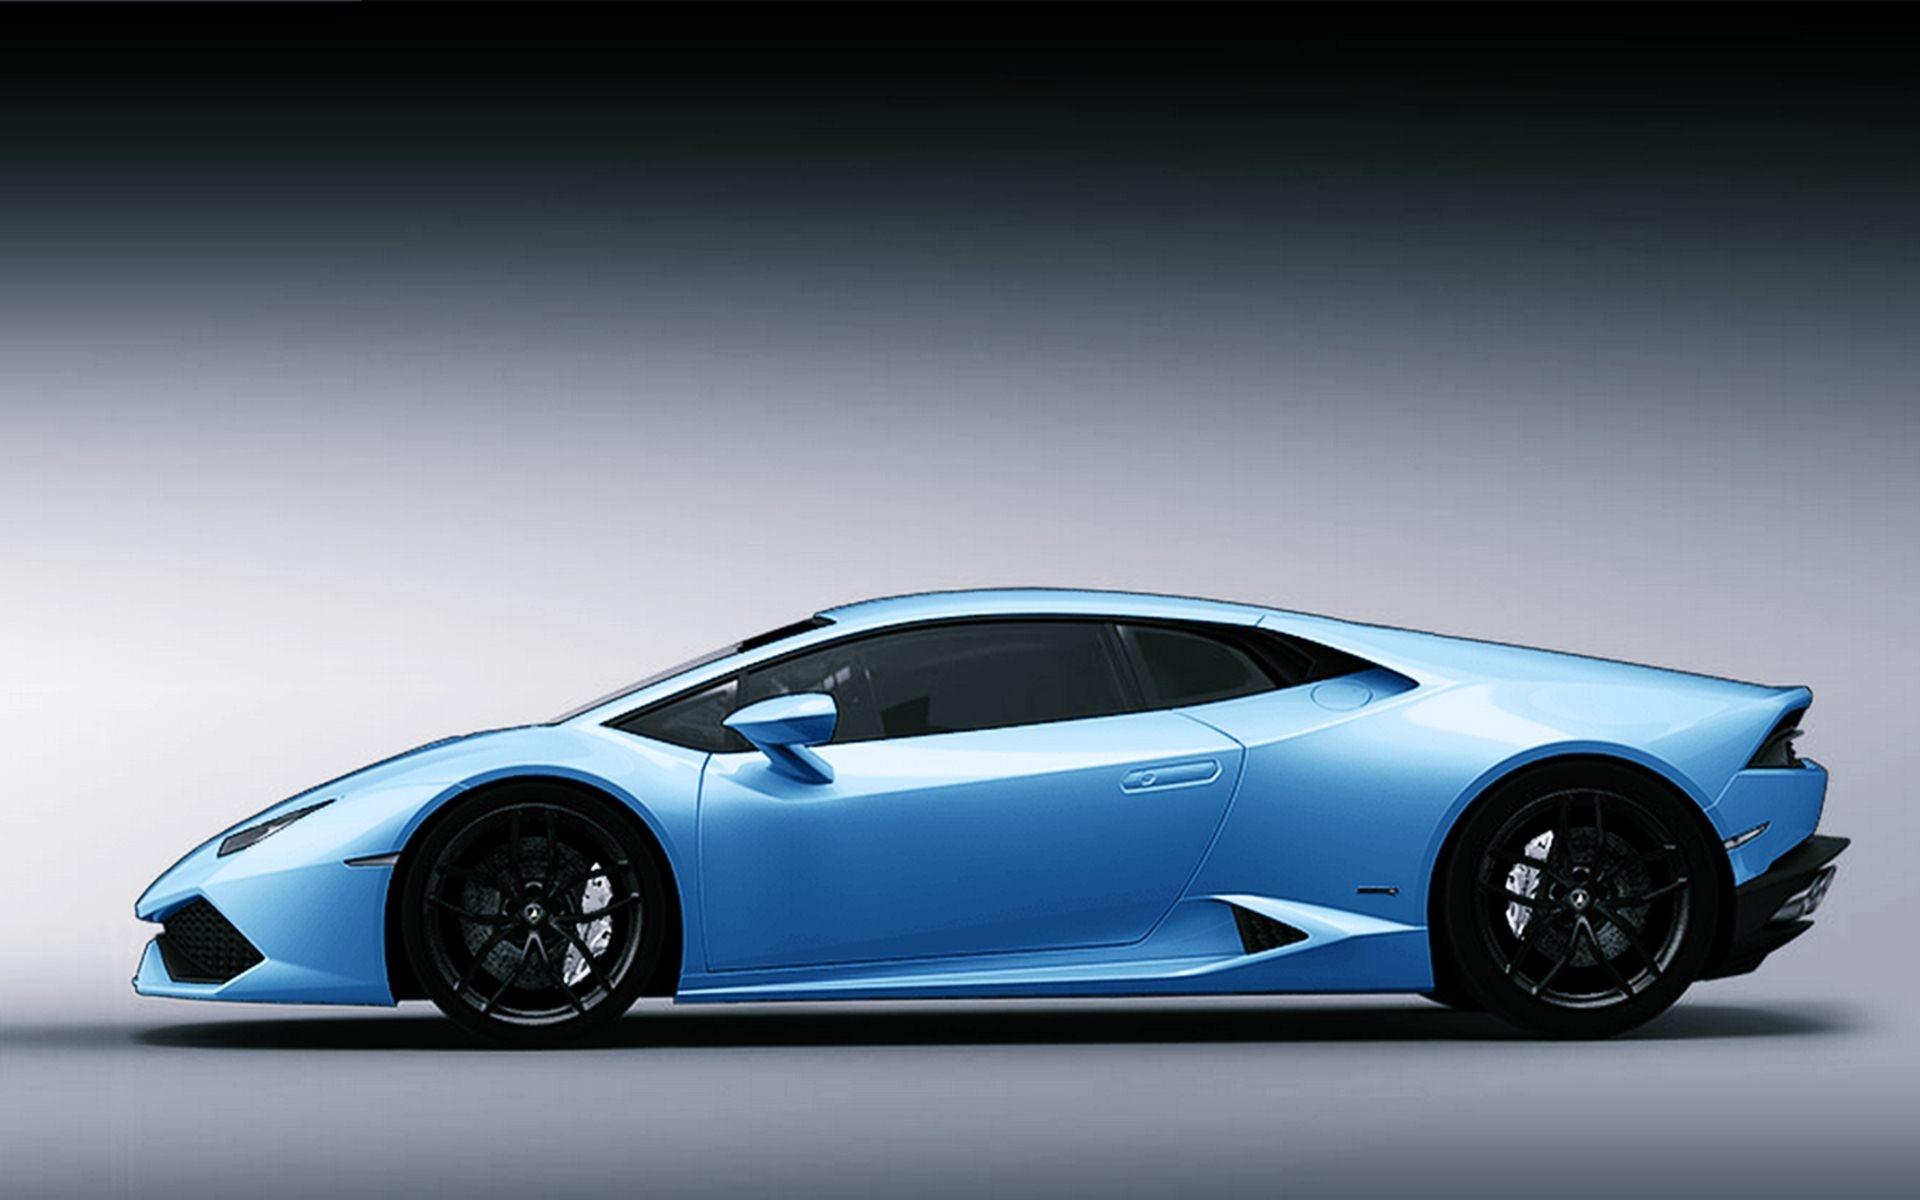 Blue Lamborghini Wallpapers 596 Cool Wallpaper